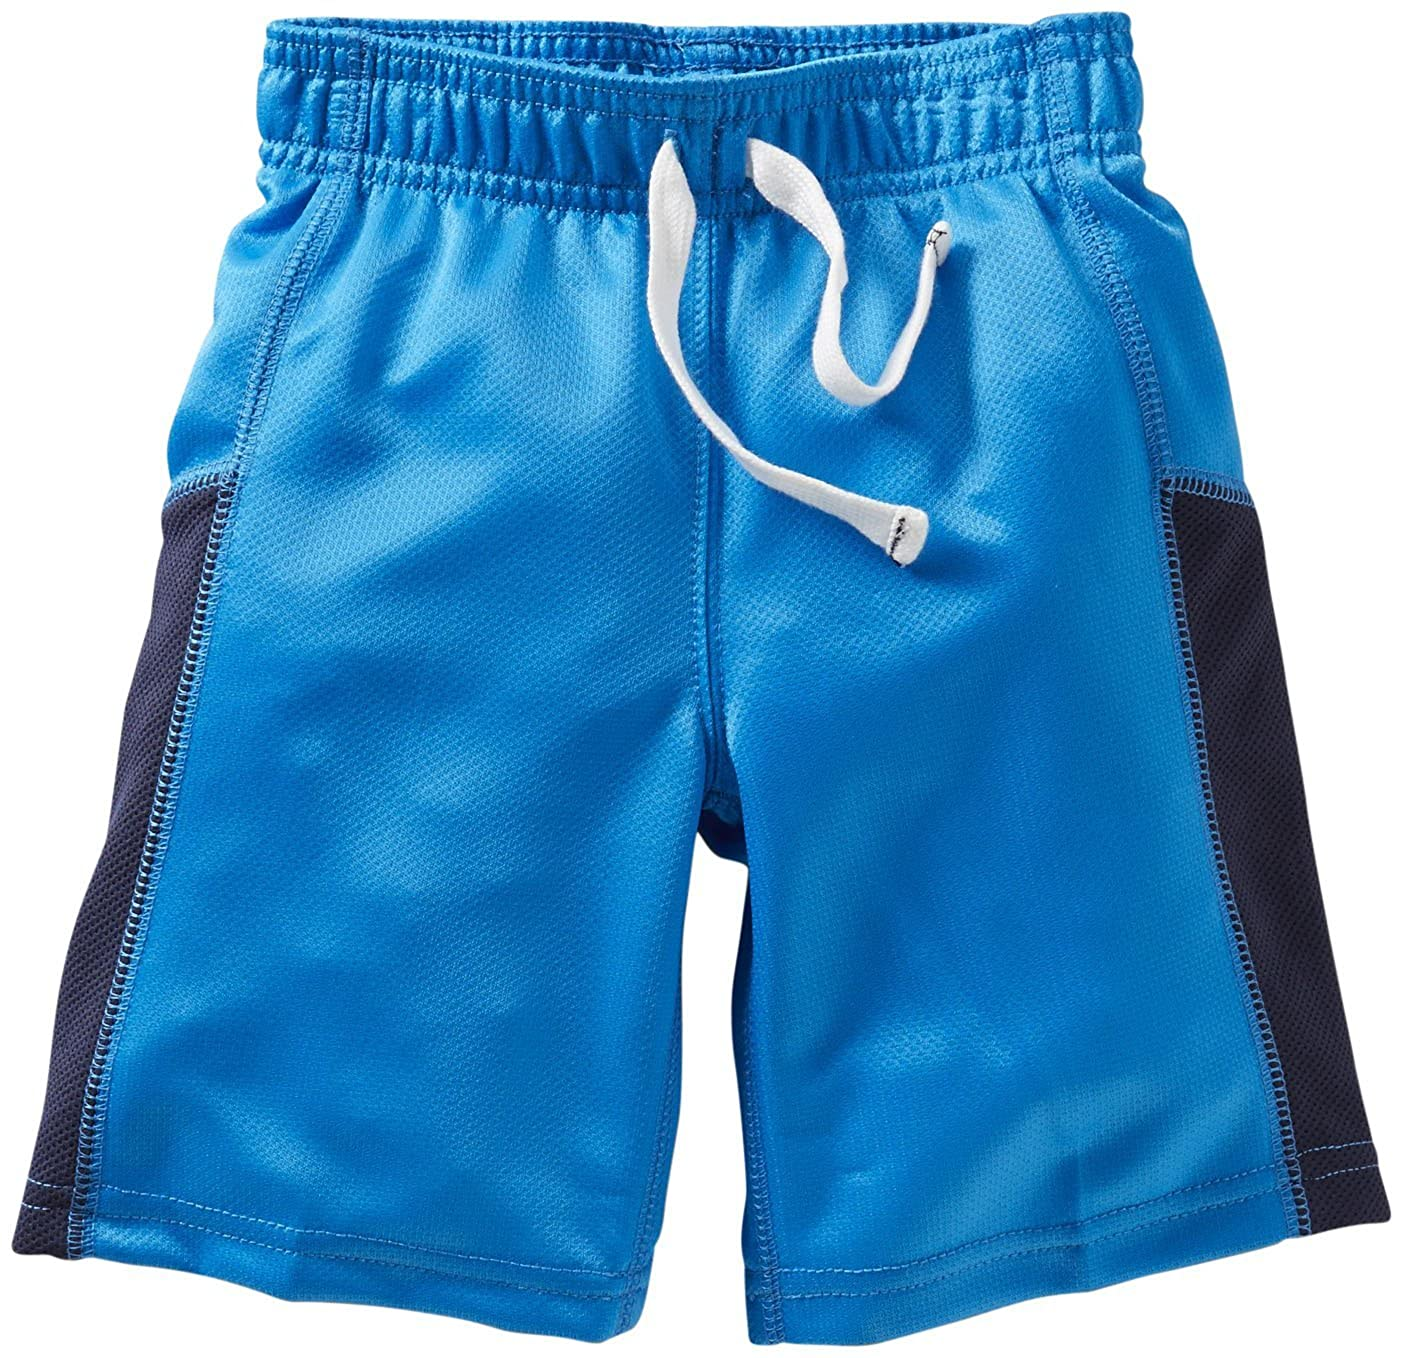 Carter's Boys' Mesh Shorts (Toddler/Kids) Blue)